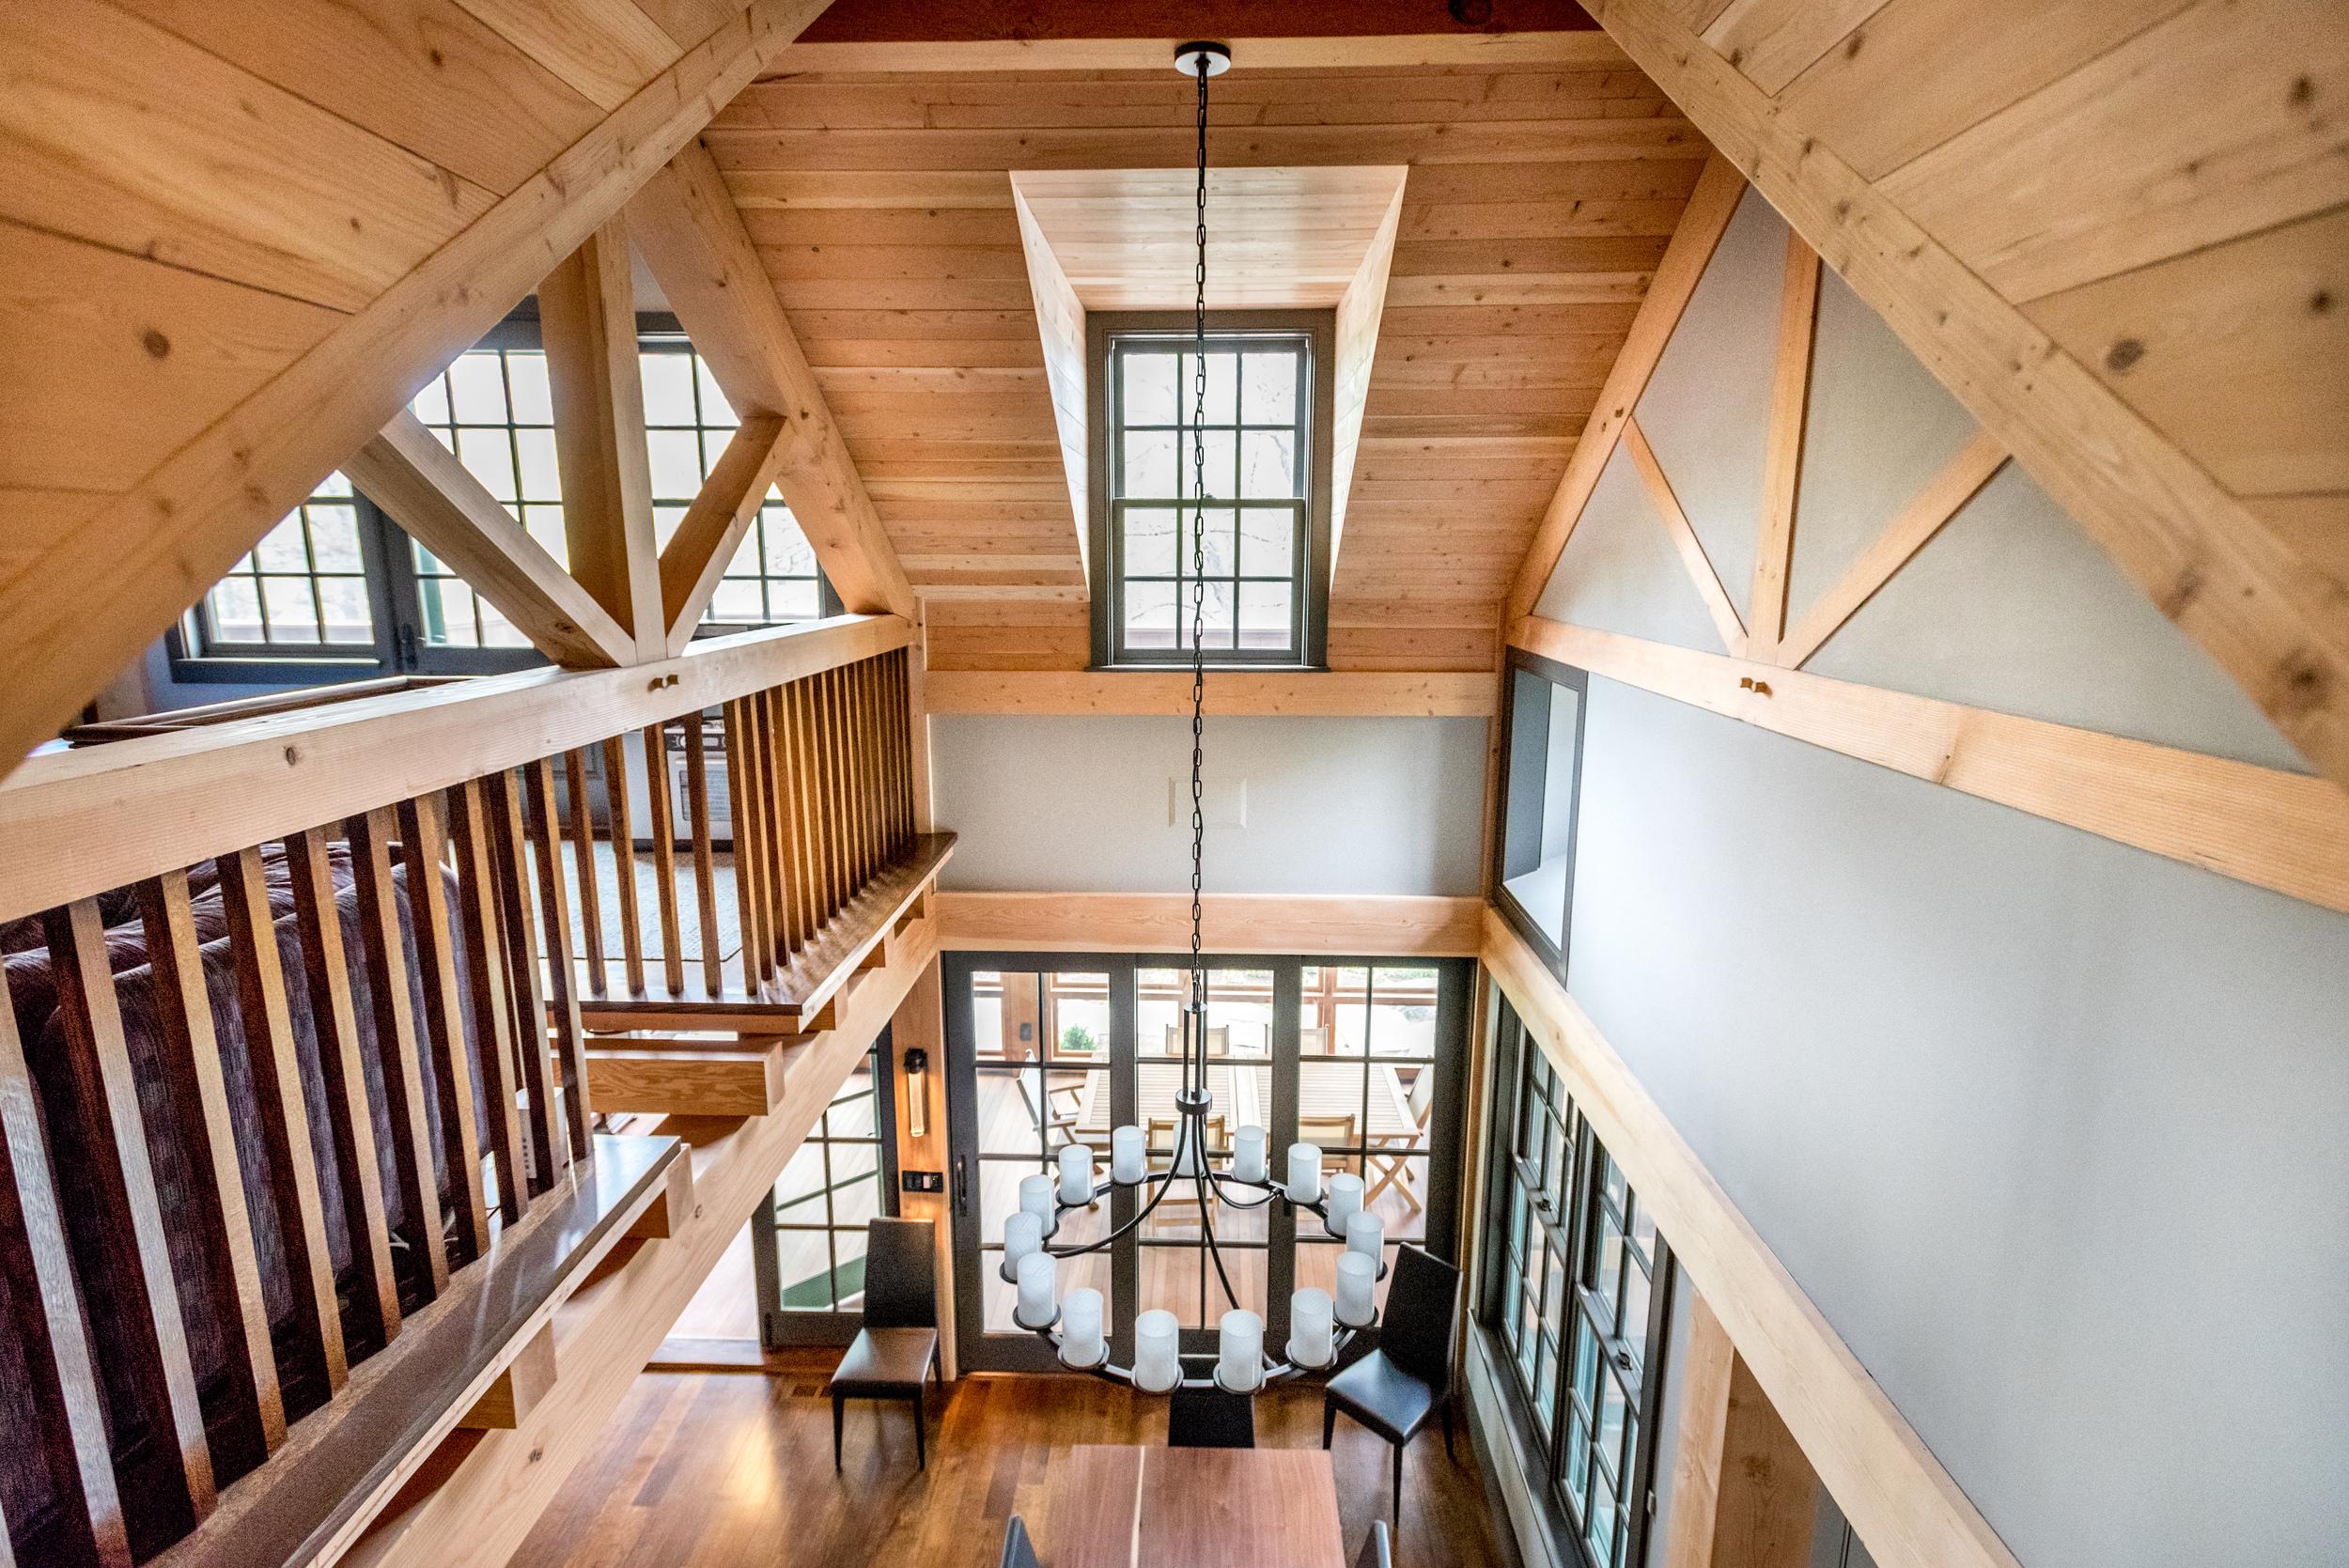 elegant-woowork-interior-lake-house-ceiling-beans-timber.jpg